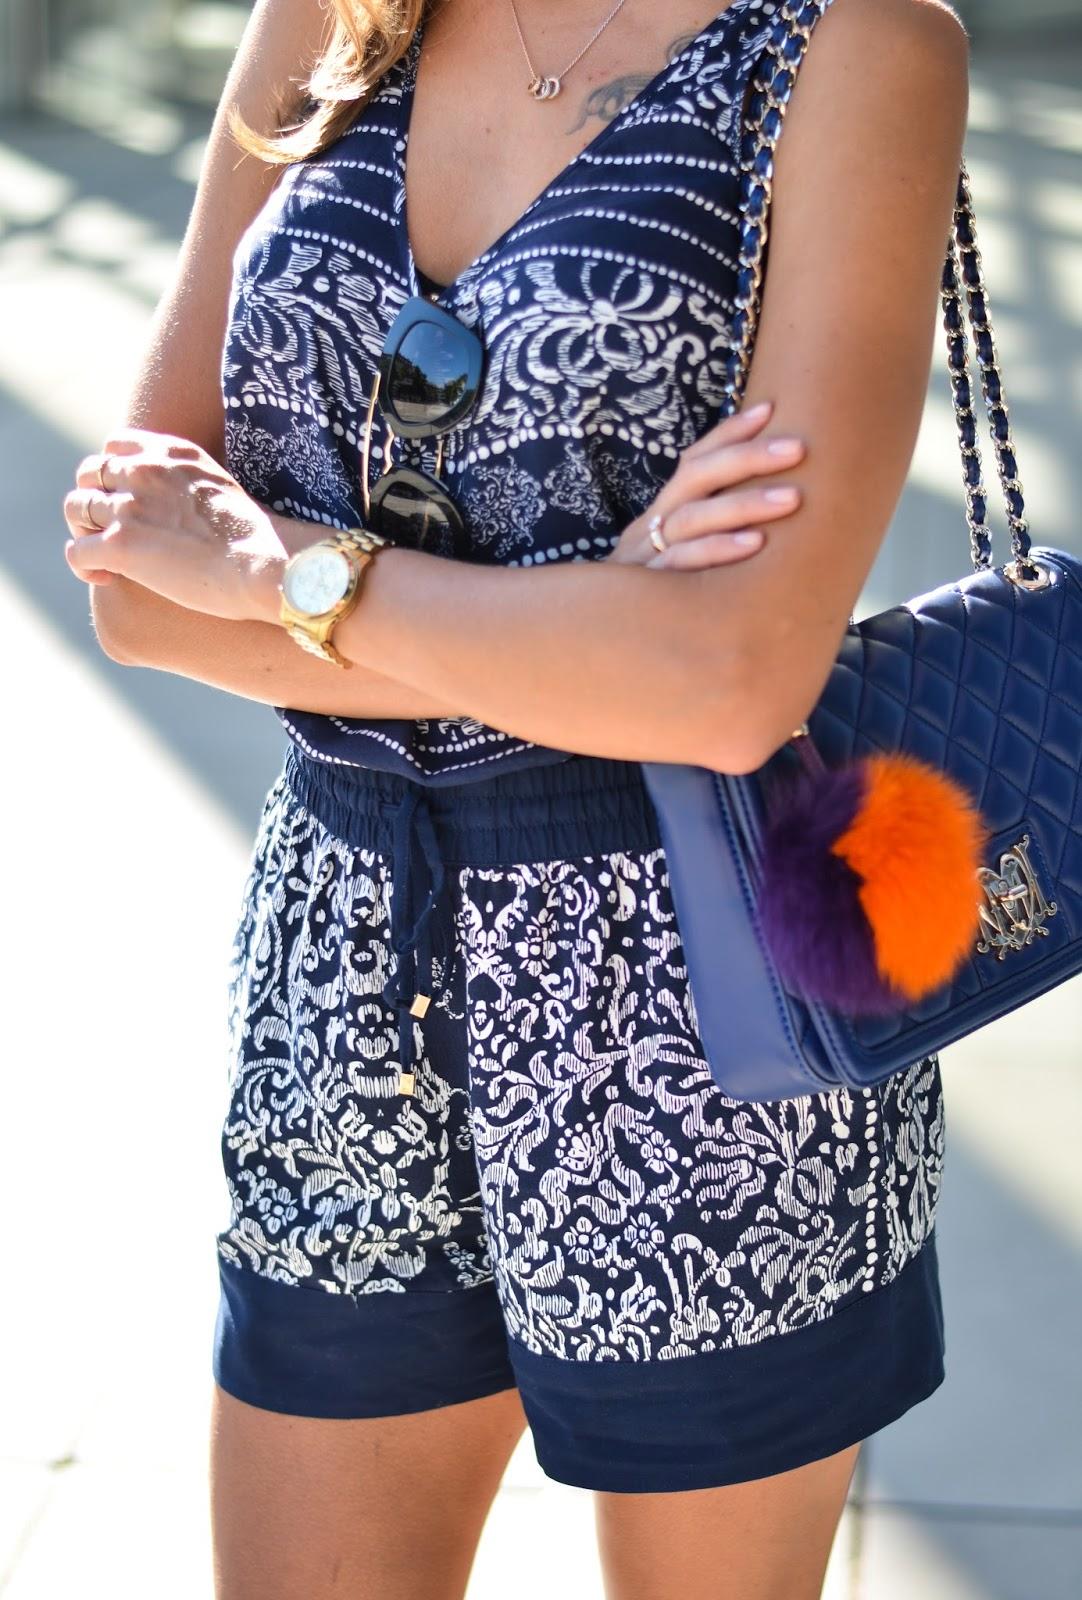 kristjaana mere blue outfit moschino bag prada sunglasses fur bag charm